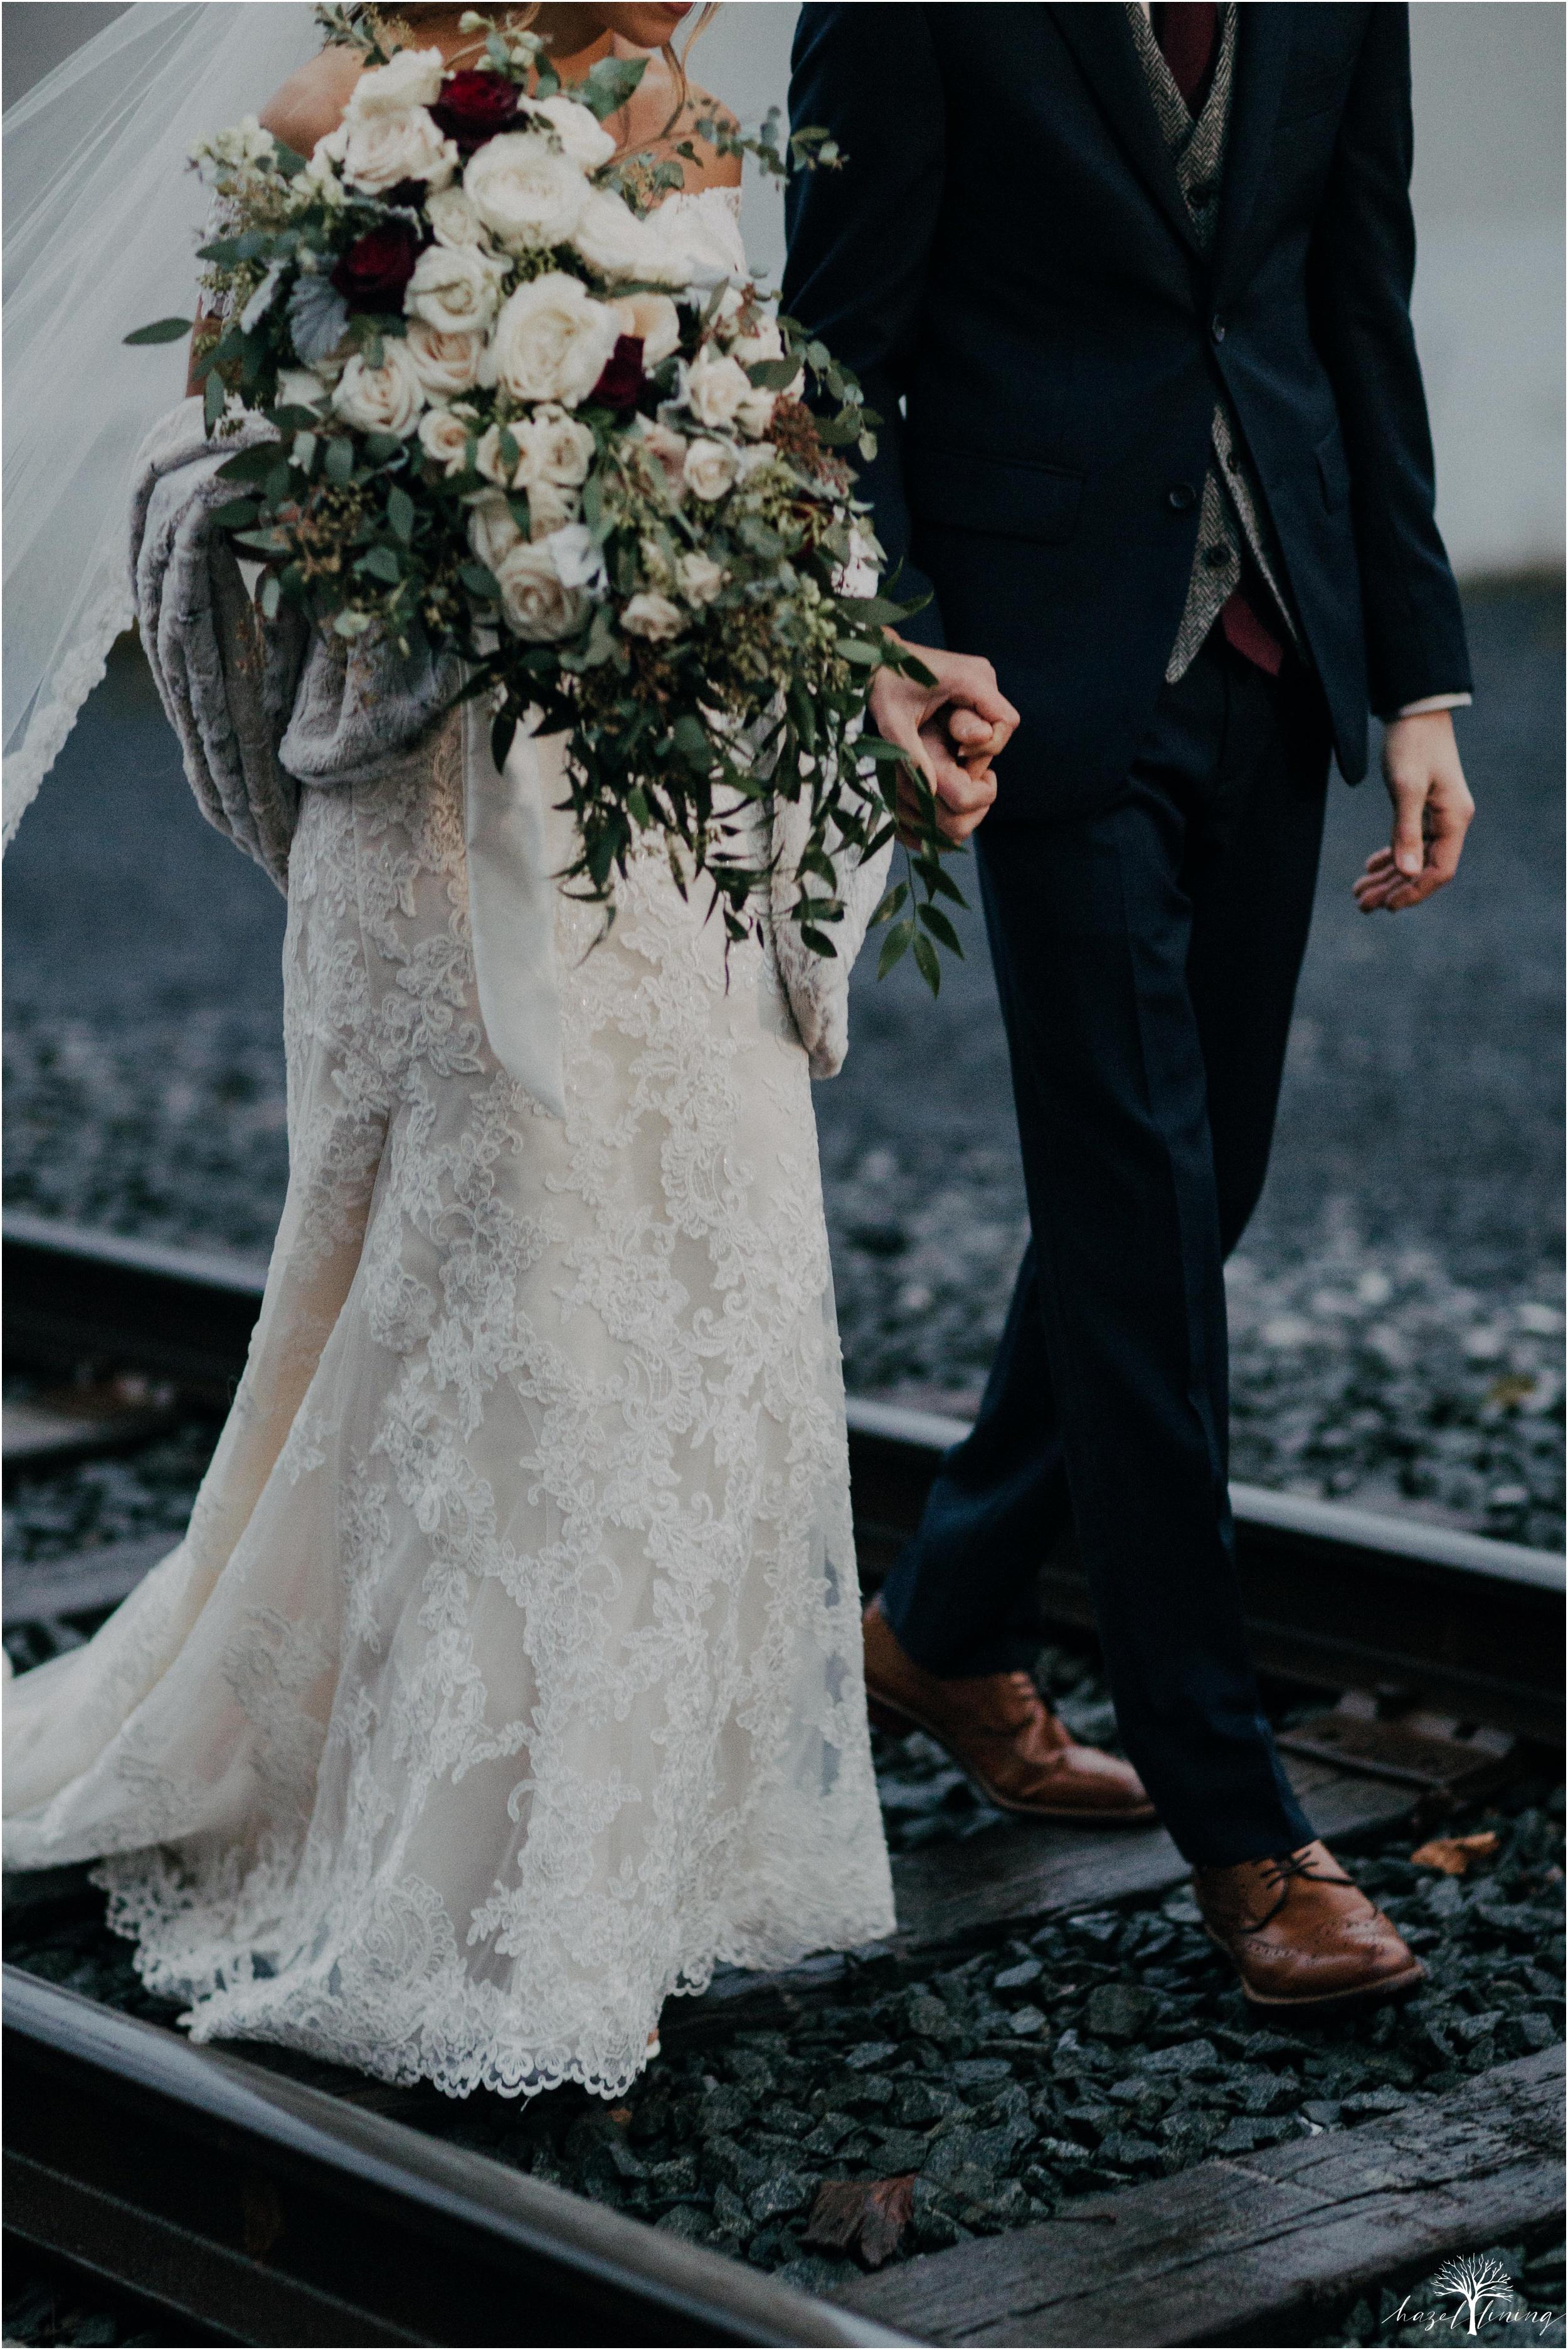 emma-matt-gehringer-the-booking-house-lancaster-manhiem-pennsylvania-winter-wedding_0103.jpg